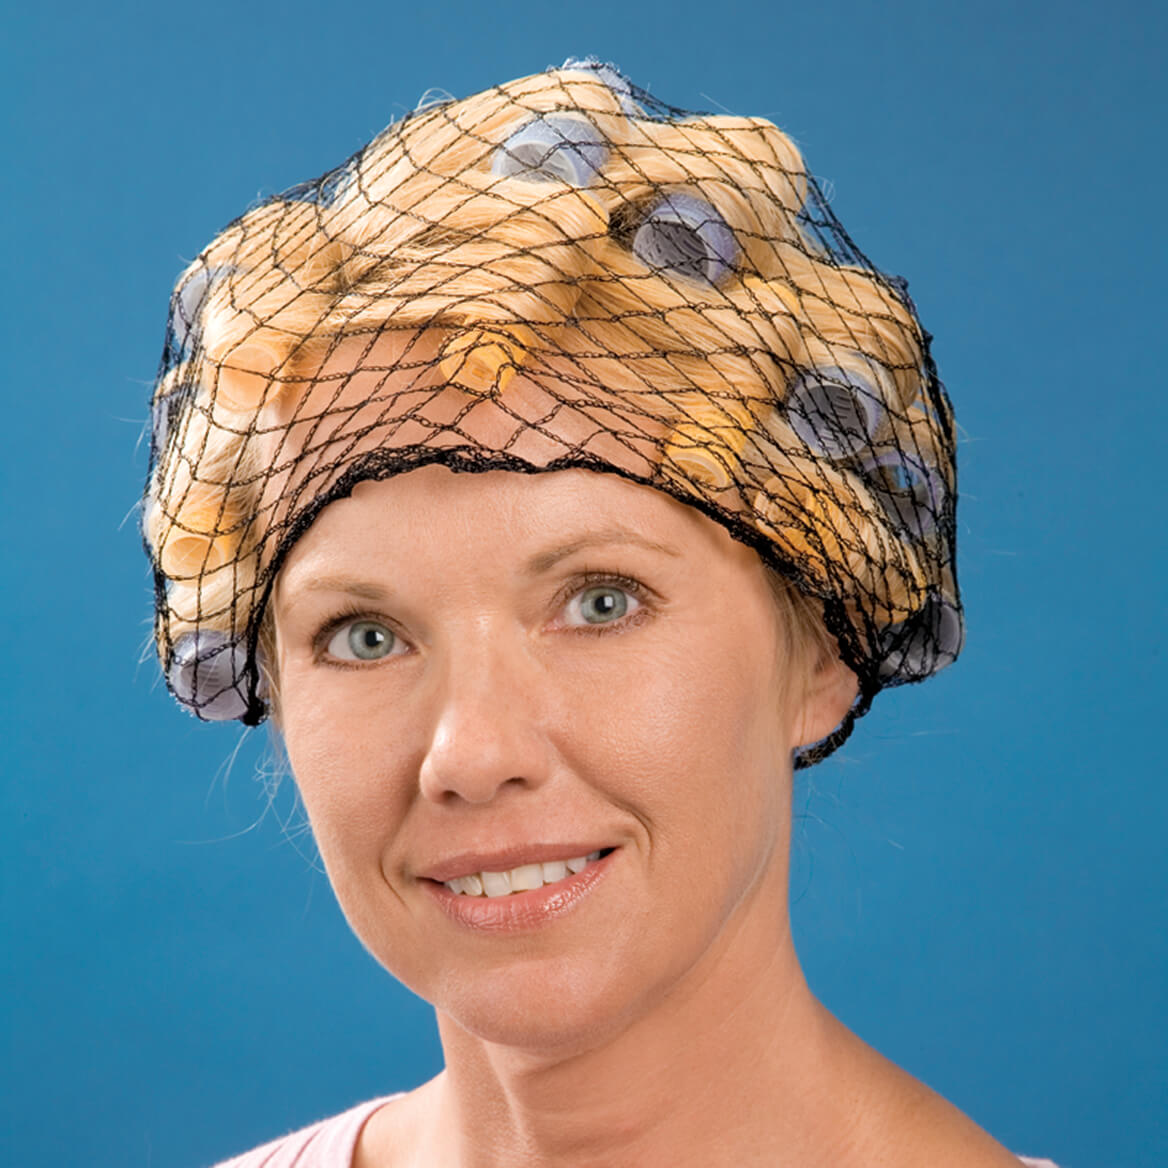 Black Hair Nets - Set Of 3-302615